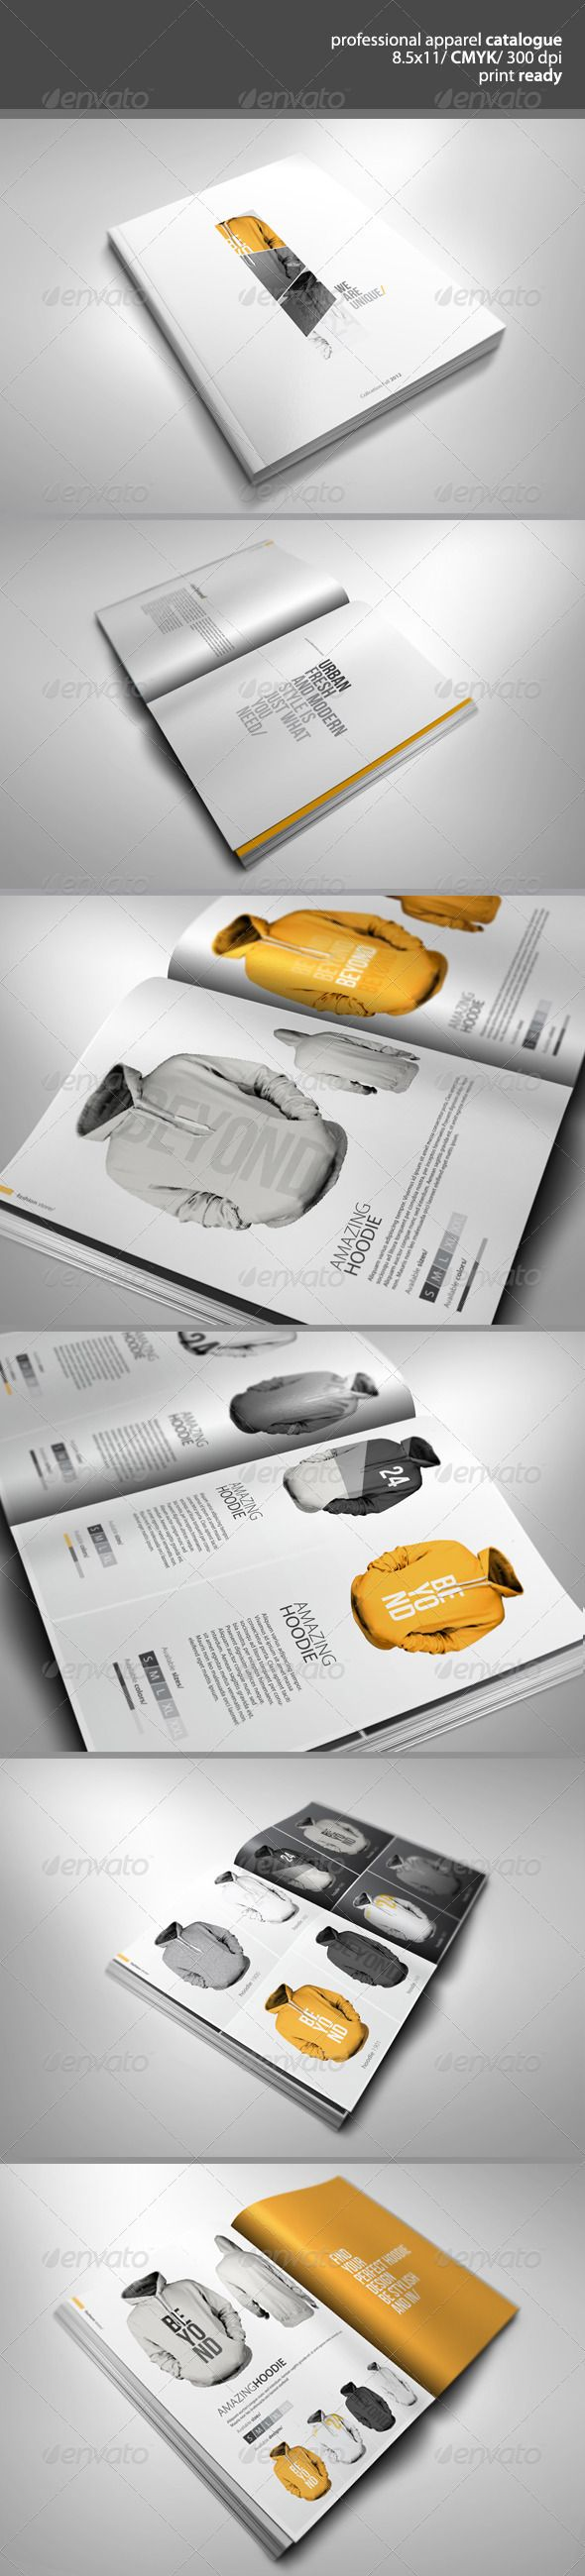 Professional Apparel Catalogue - GraphicRiver Item for Sale